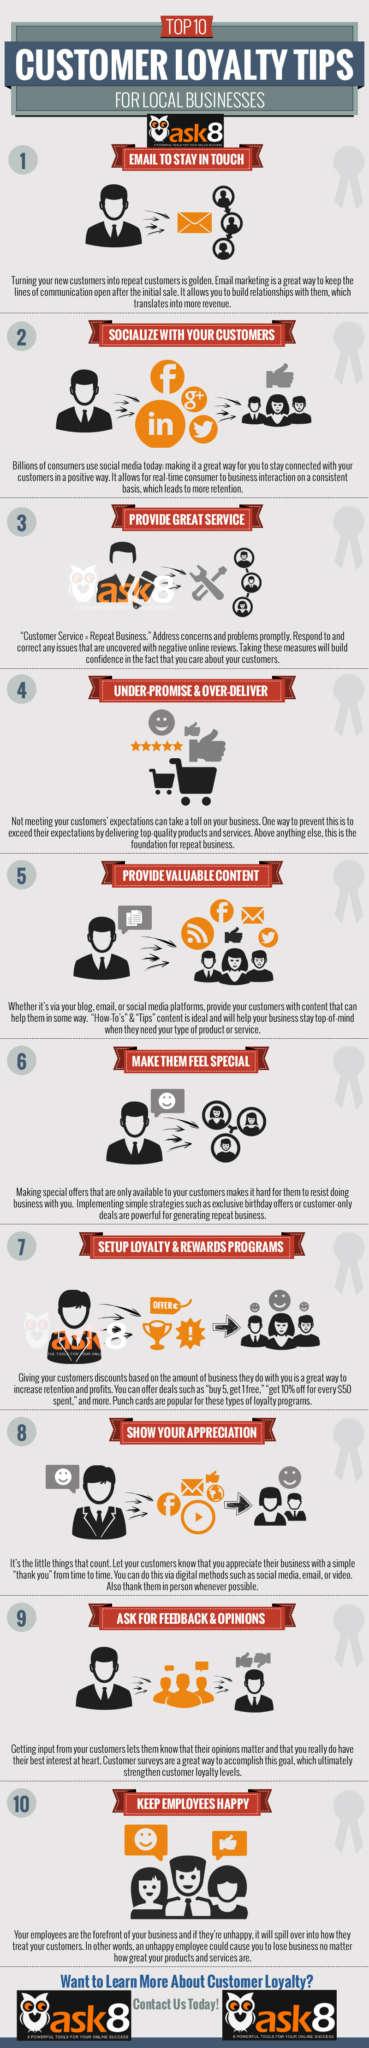 customer-loyalty-tips